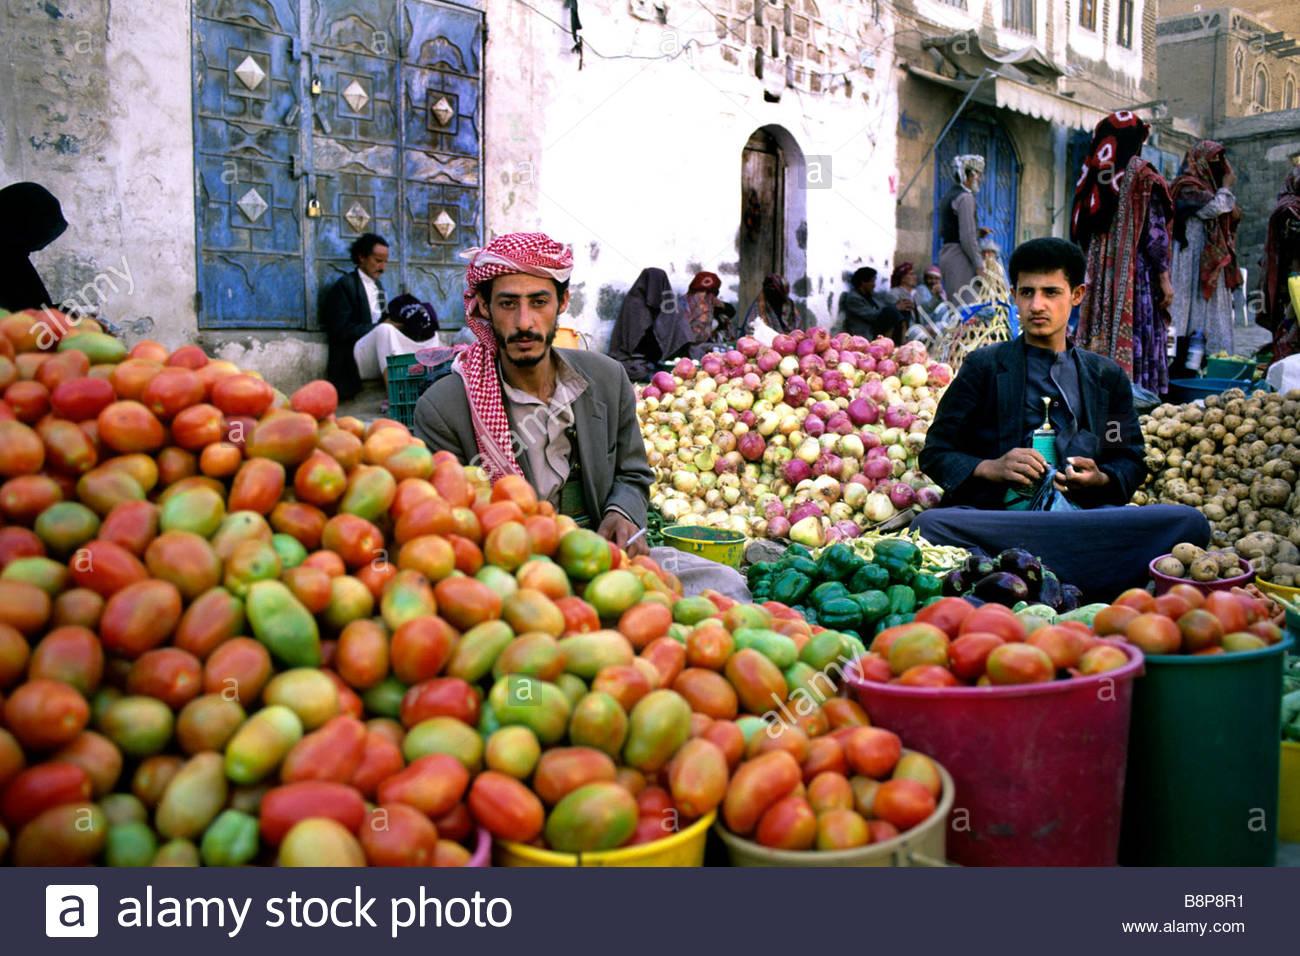 market, yemen, arabian peninsula - Stock Image